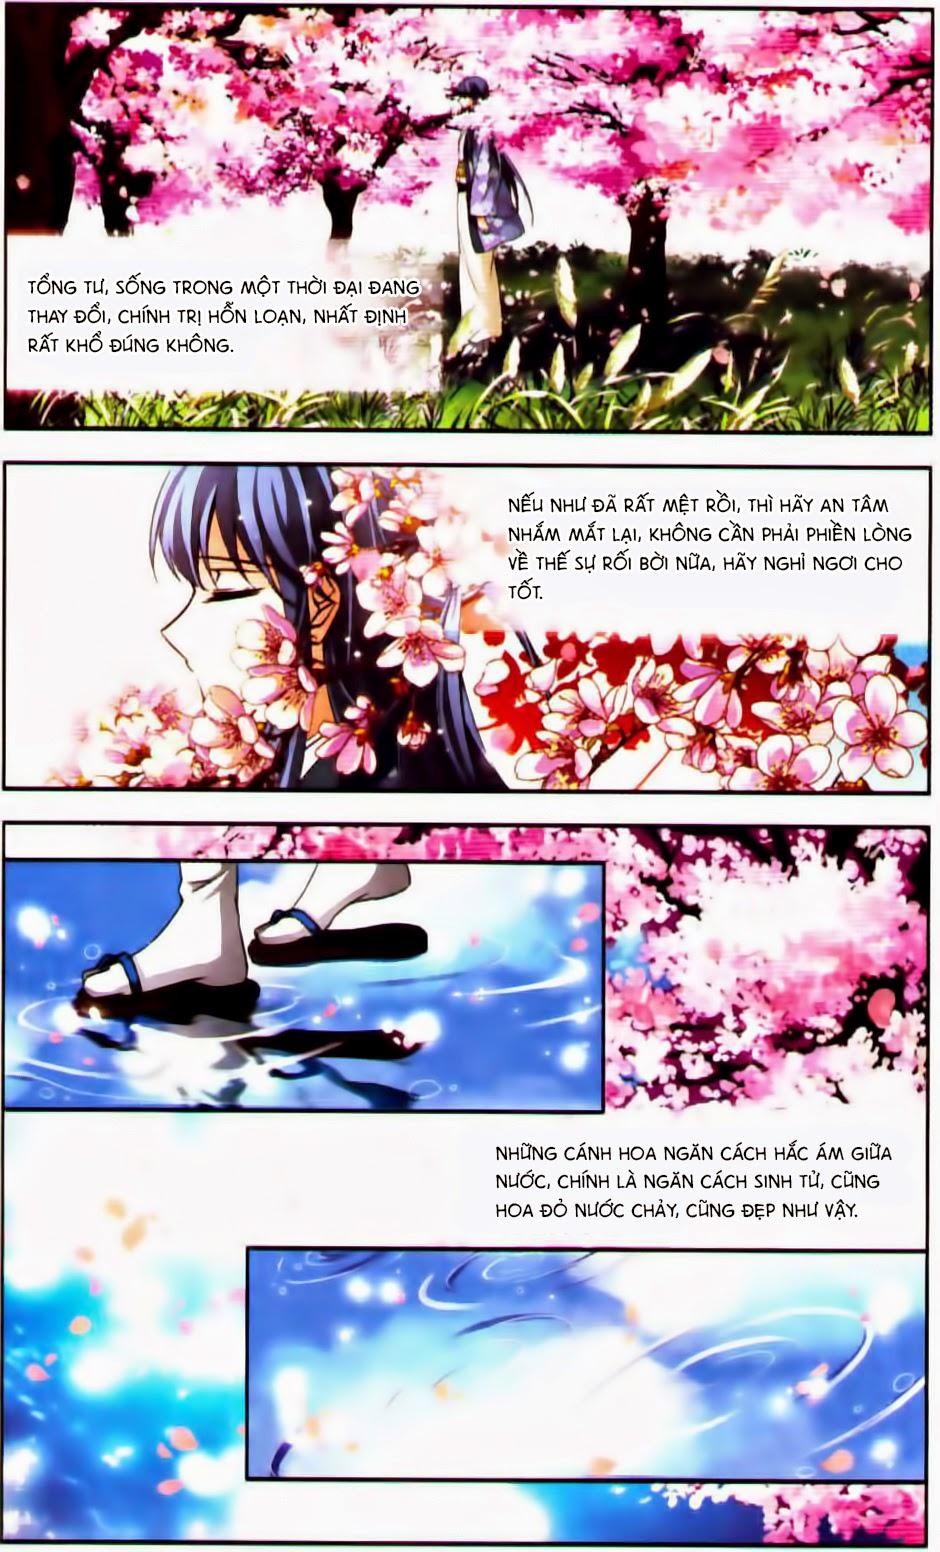 a3manga.com tam trao tien the chi lu chap 46